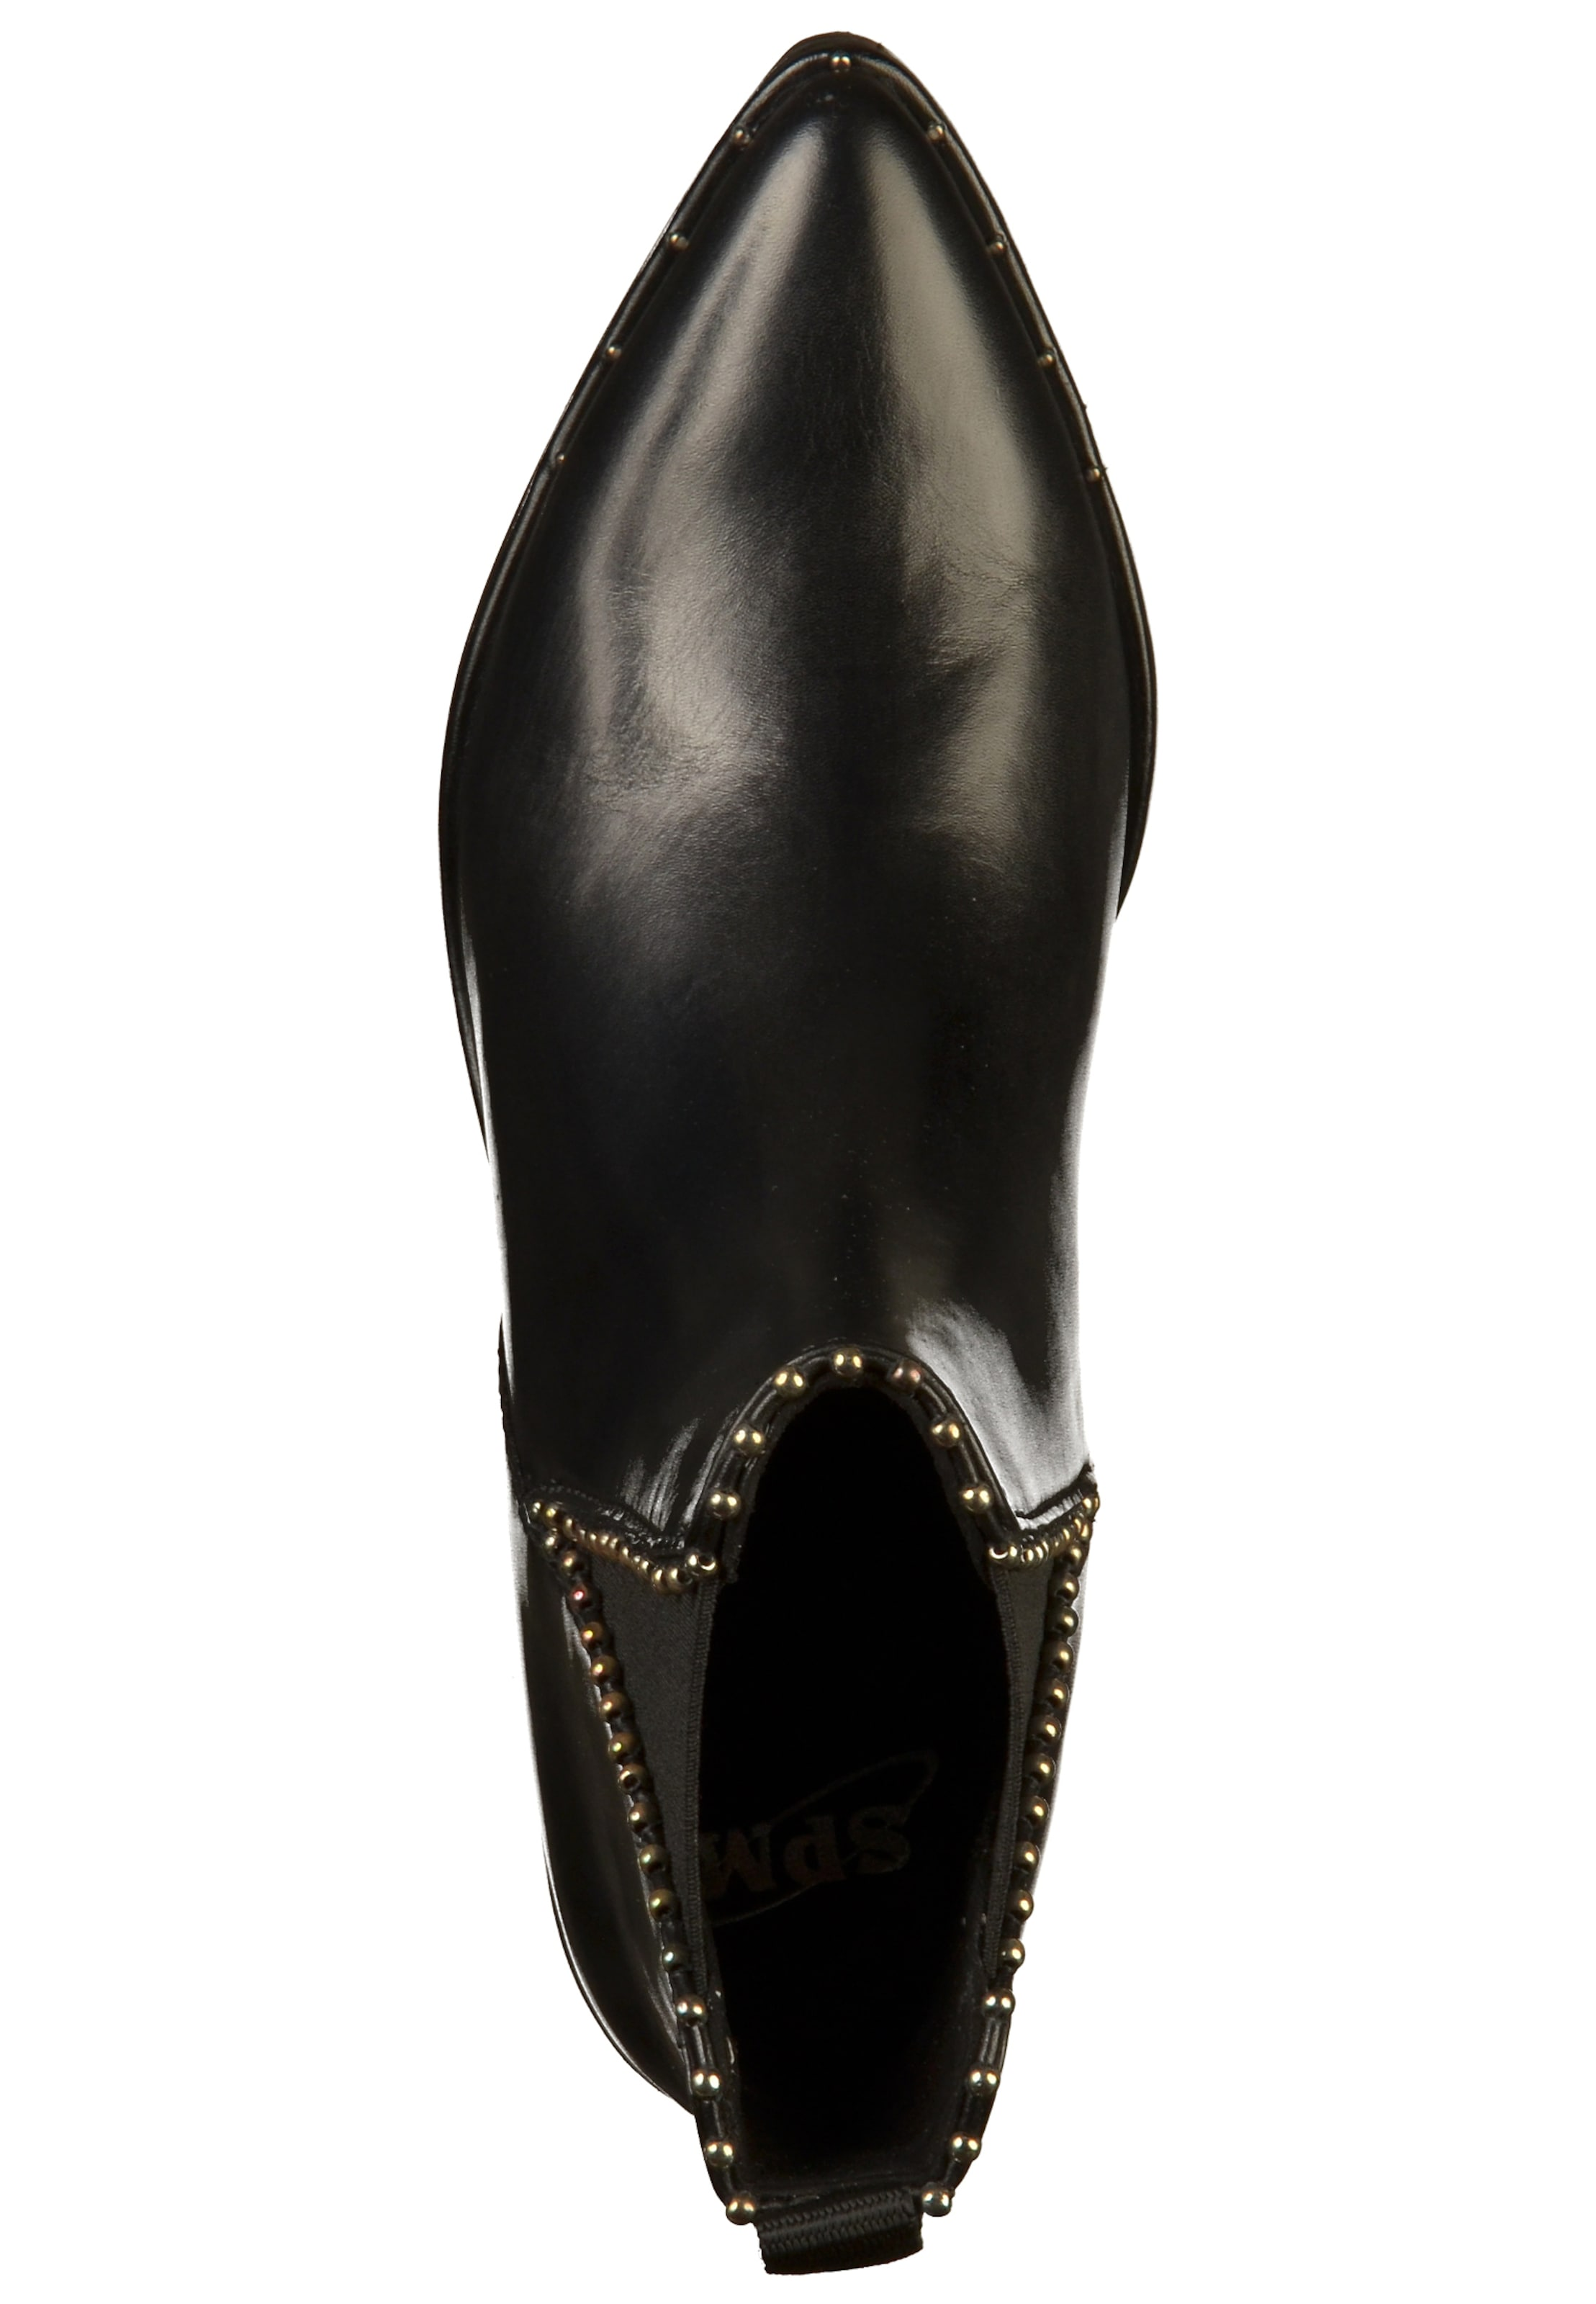 In Ankle Boot 'ballemi' Spm Schwarz 5Aj4L3R